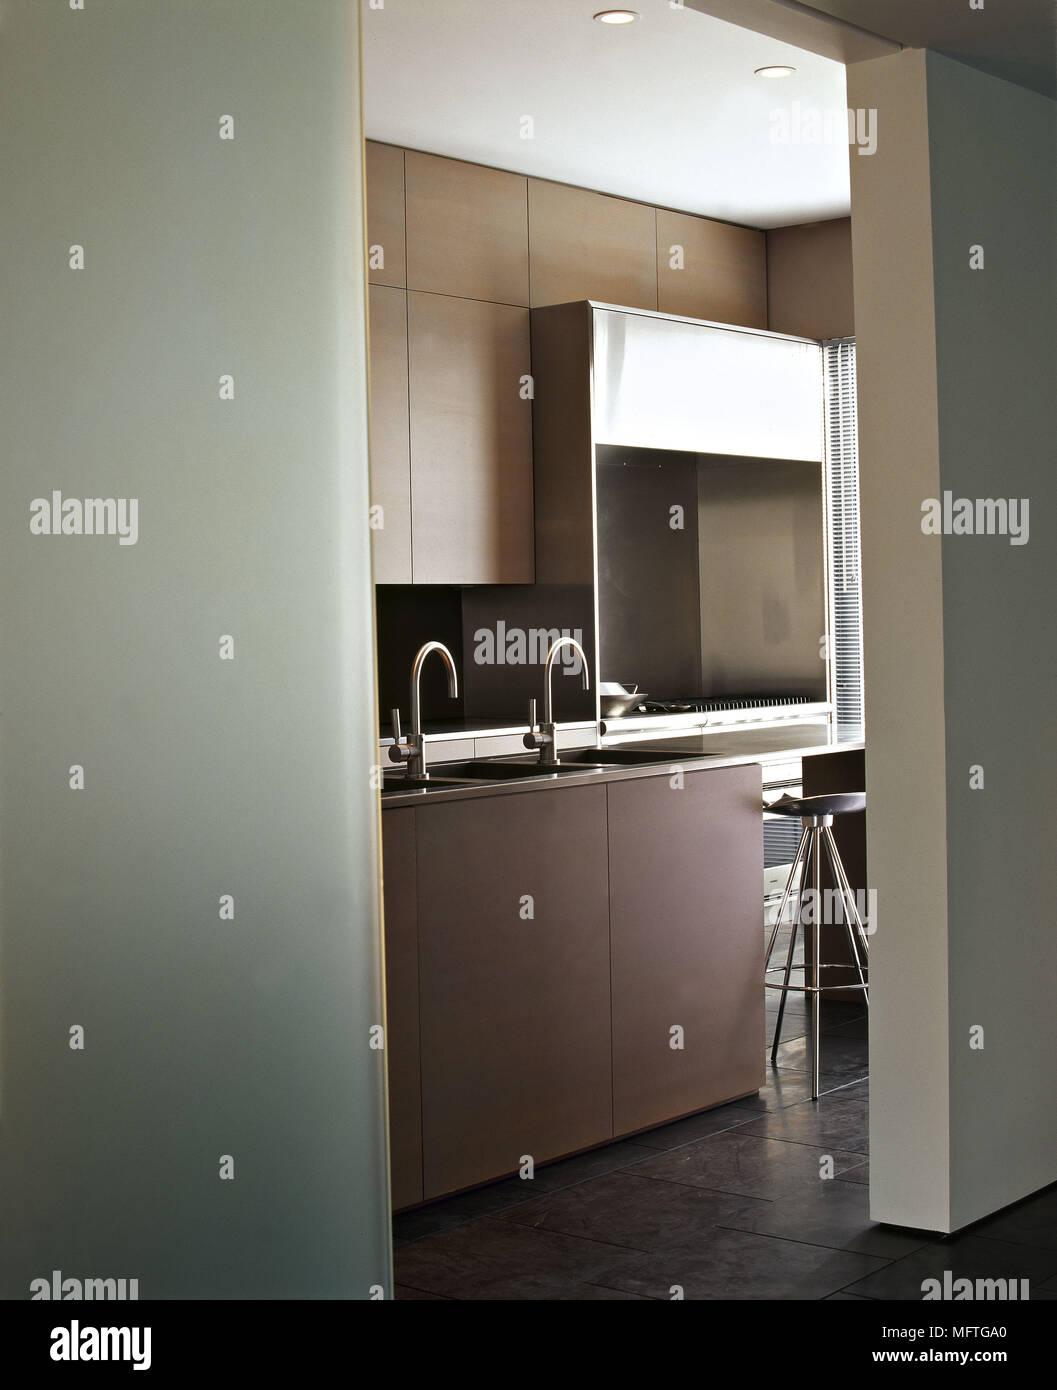 Modern minimalist kitchen detail  interiors kitchens muted colours - Stock Image